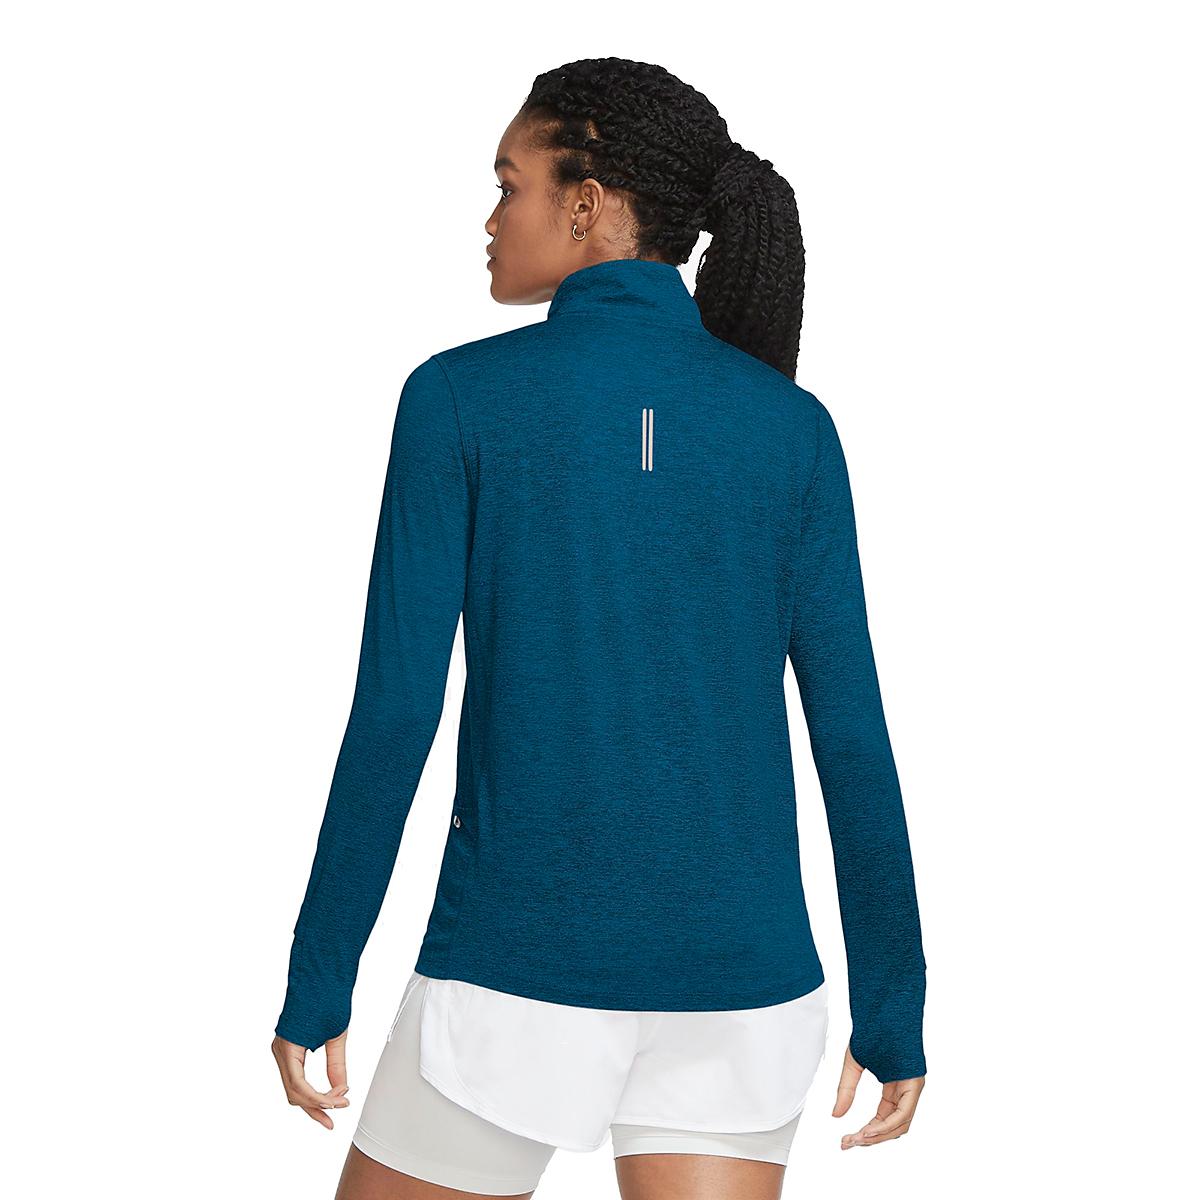 Women's Nike Nike Element 1/2-Zip Running Top - Color: Deep Ocean/Green - Size: XS, Deep Ocean/Green, large, image 2